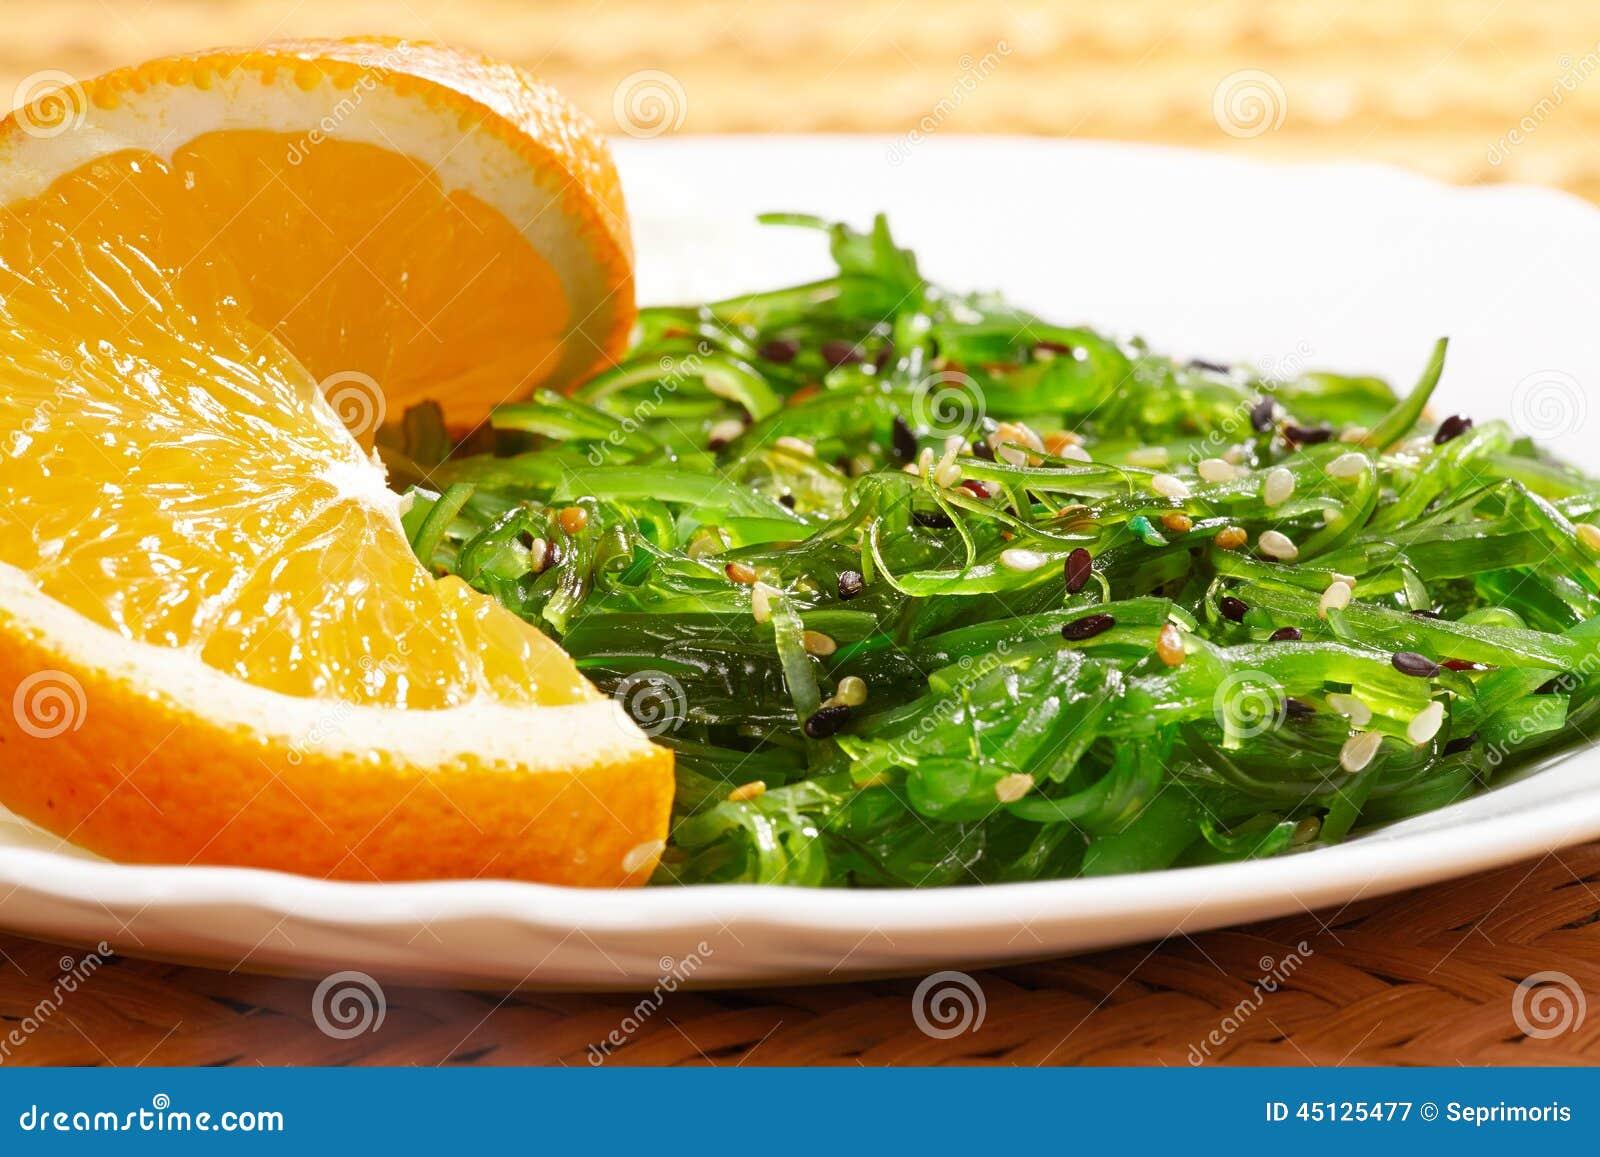 Vegan food japanese cuisine seaweed salad with orange in for Cuisine vegan